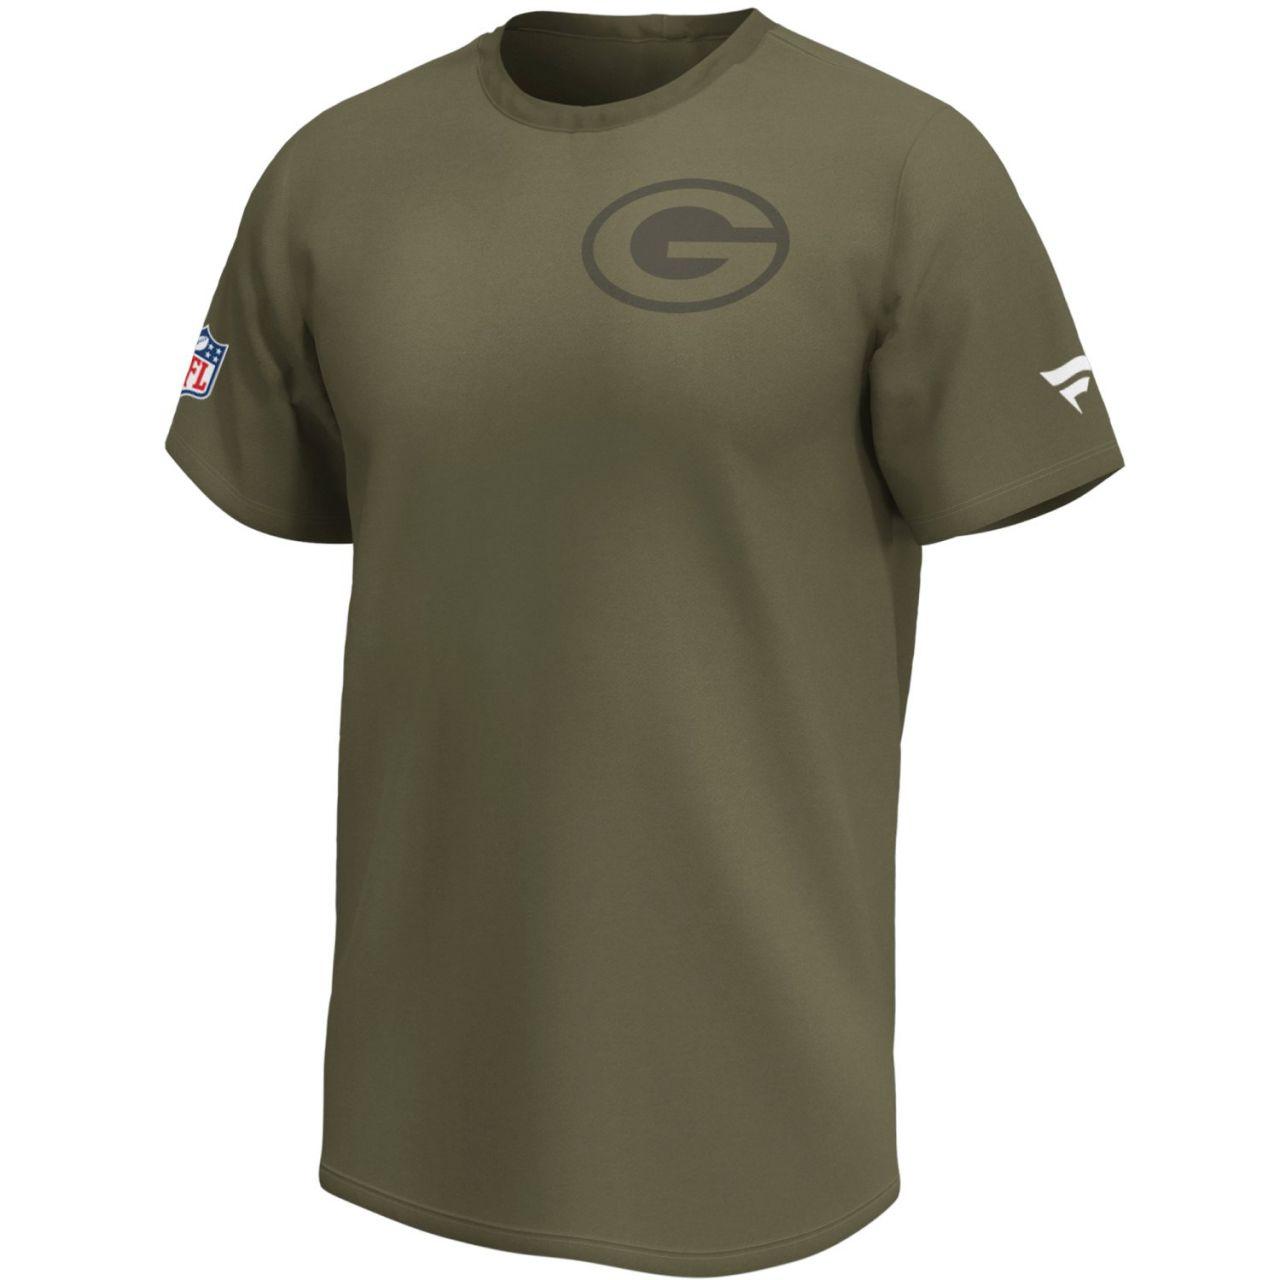 amfoo - Green Bay Packers NFL Fan Shirt Iconic army green